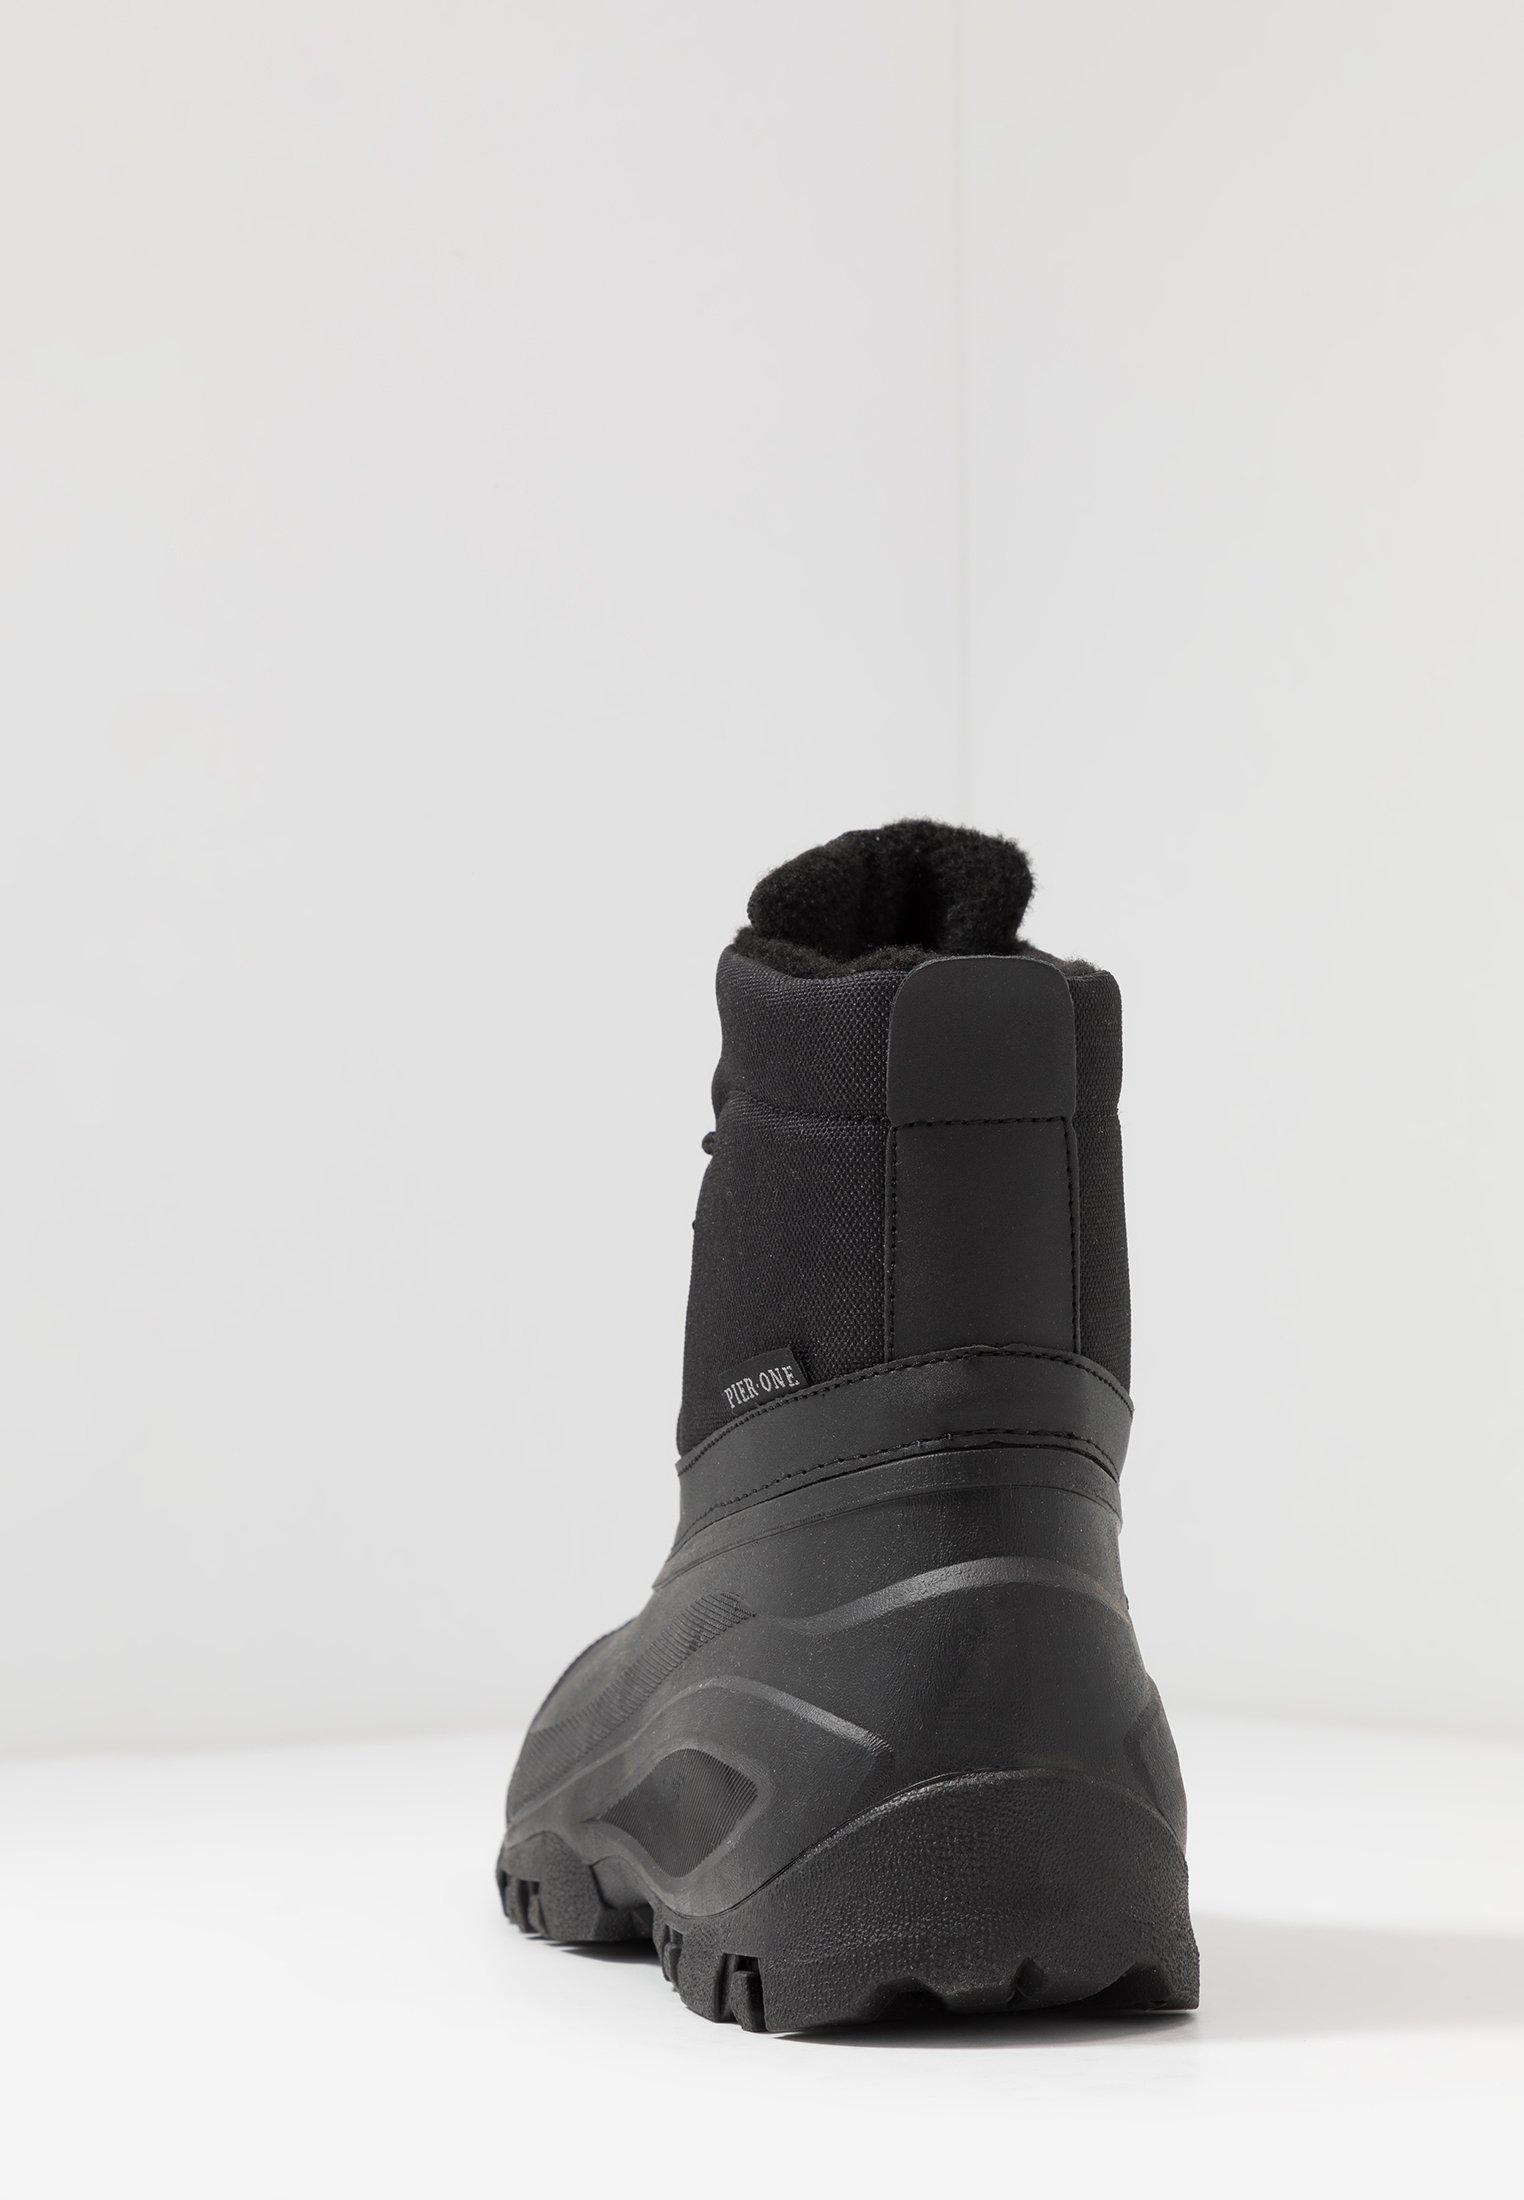 Pier One Vinterstøvler - Black/svart